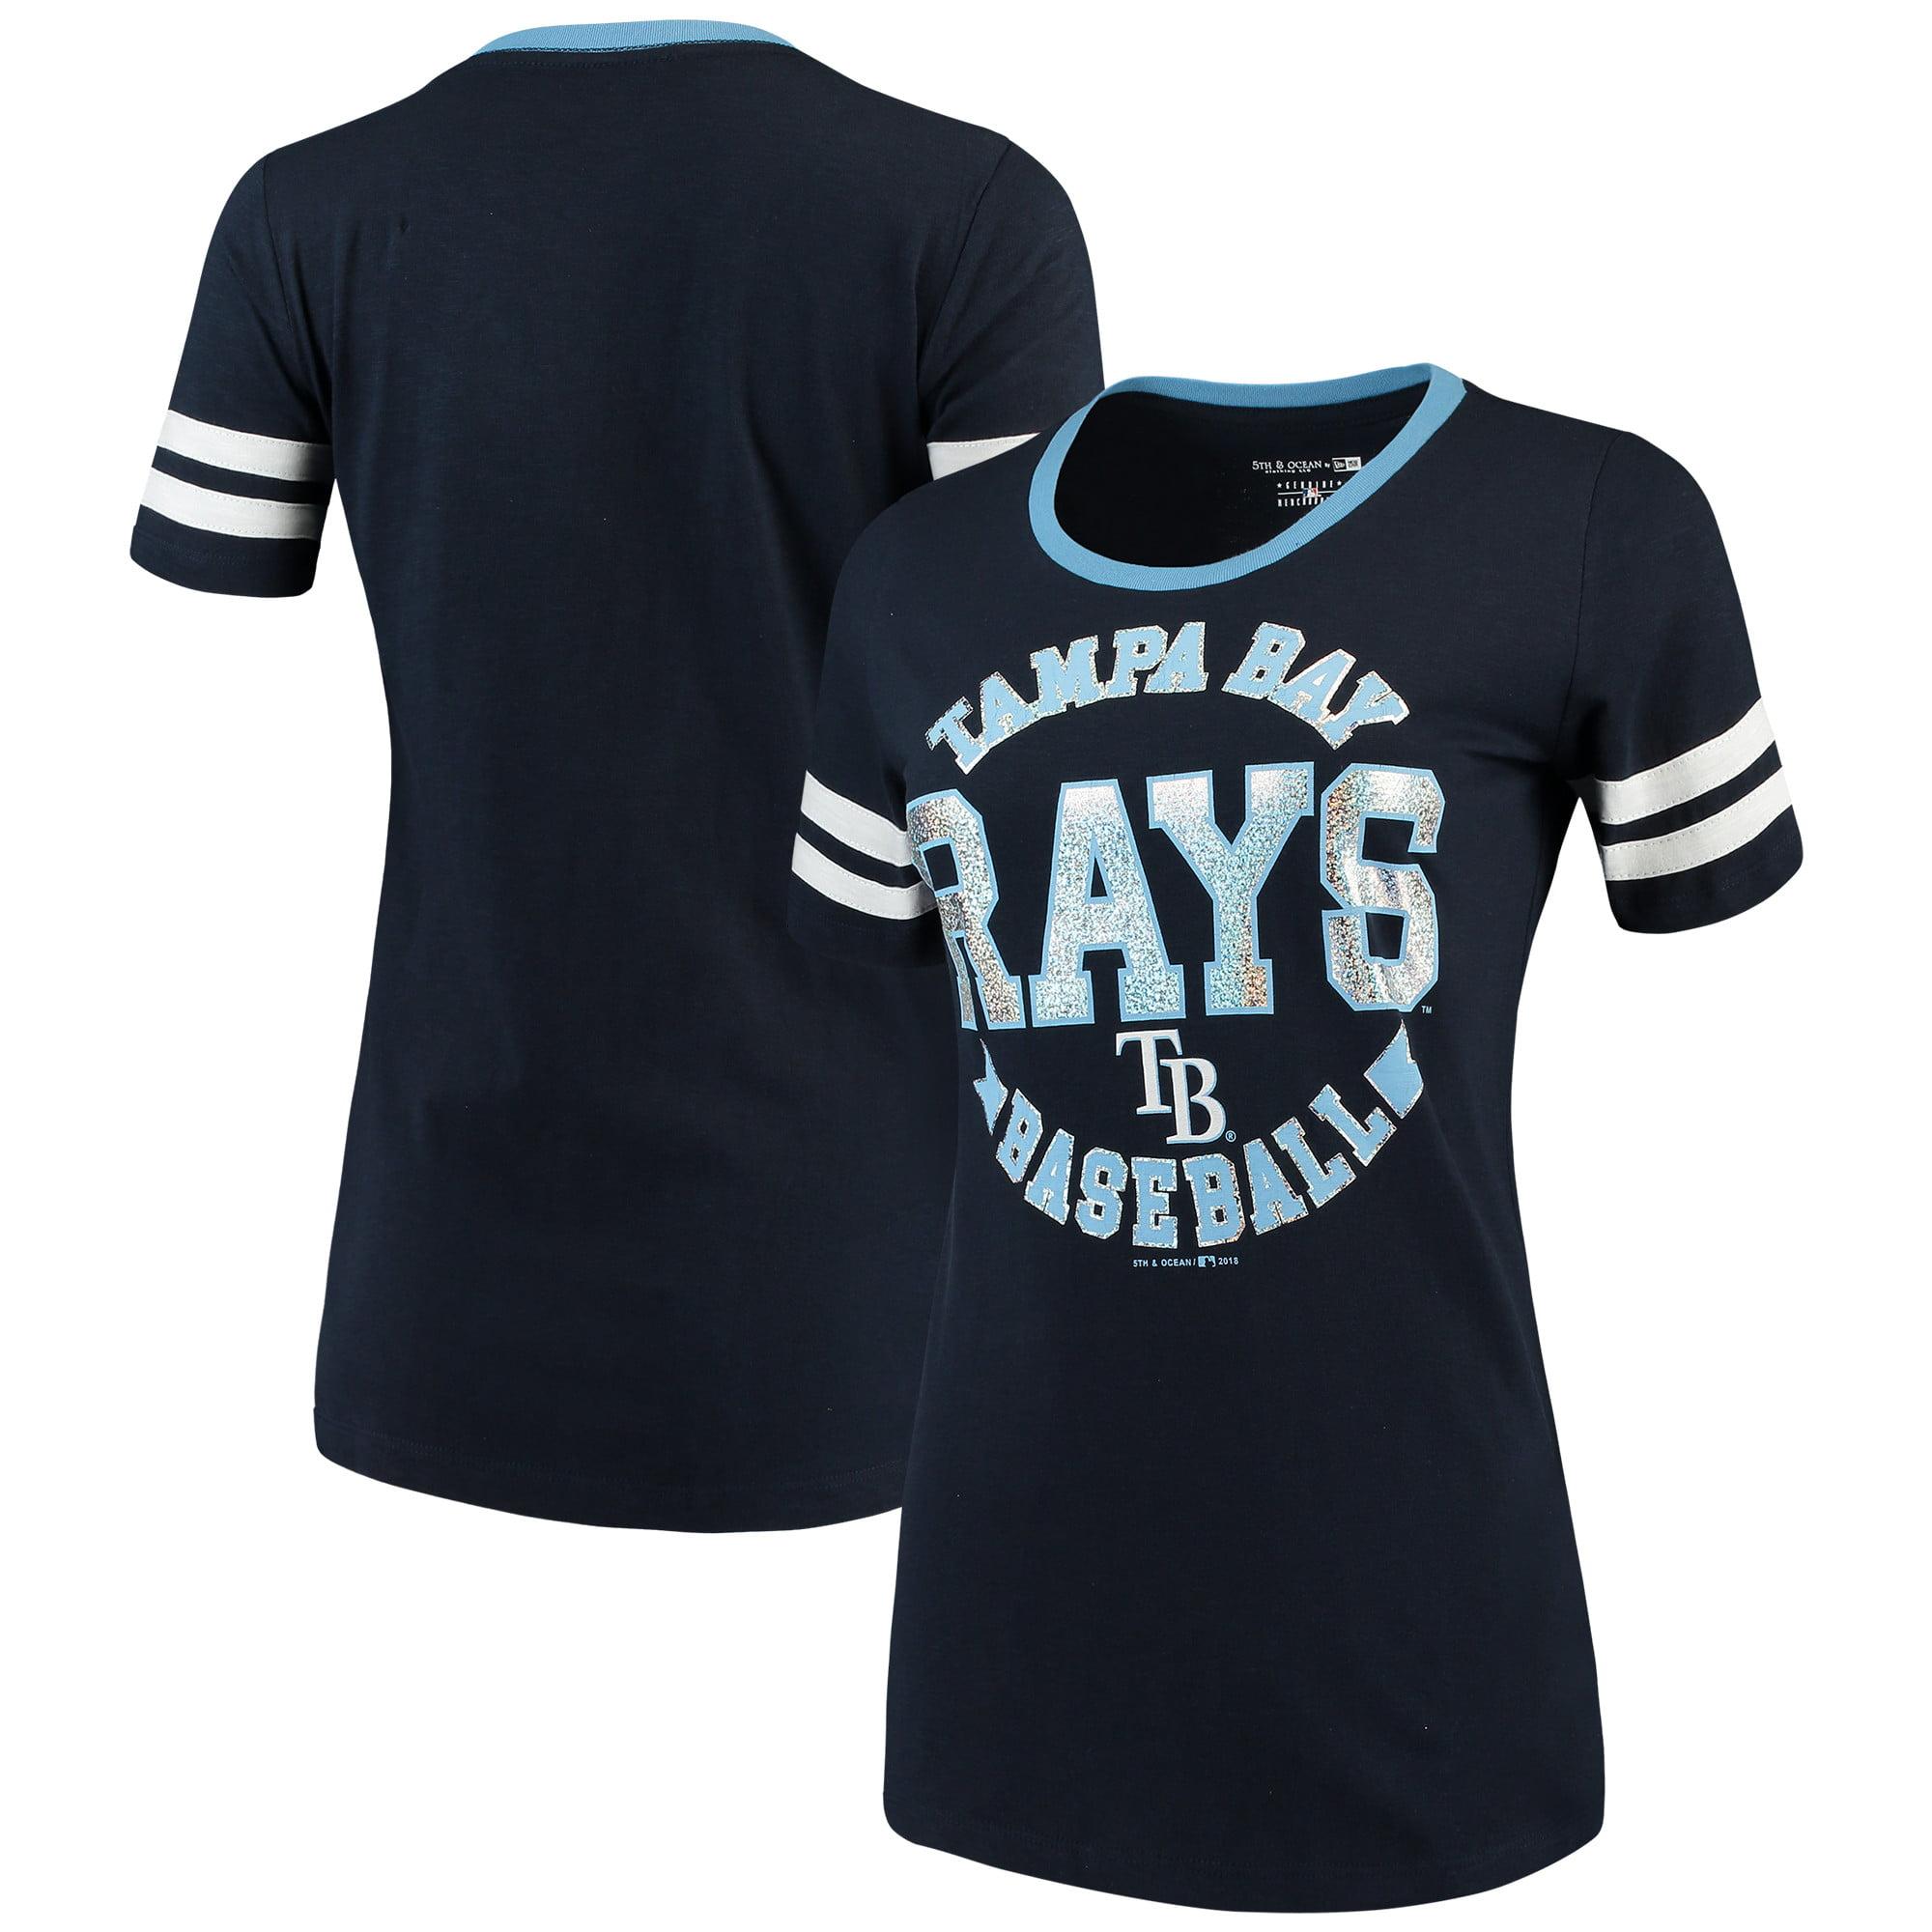 Tampa Bay Rays 5th & Ocean by New Era Women's Slub Jersey Scoop Neck Sleeve Stripes T-Shirt - Navy